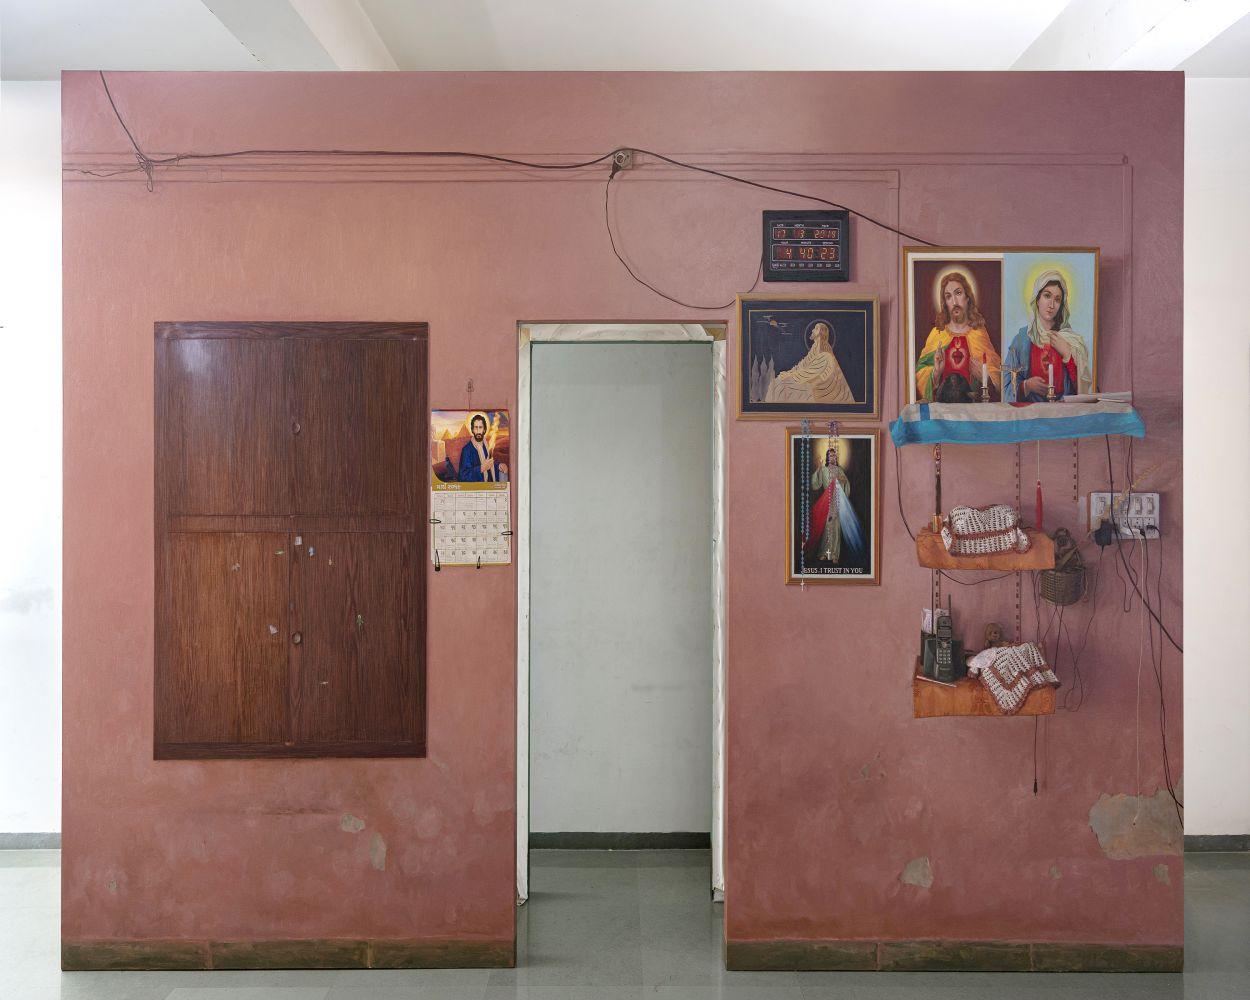 ABIR KARMAKAR Passage 4, 2020  Oil on canvas  108 x 168 in / 274.3 x 426.7 cm (Part 2 of Set 2)